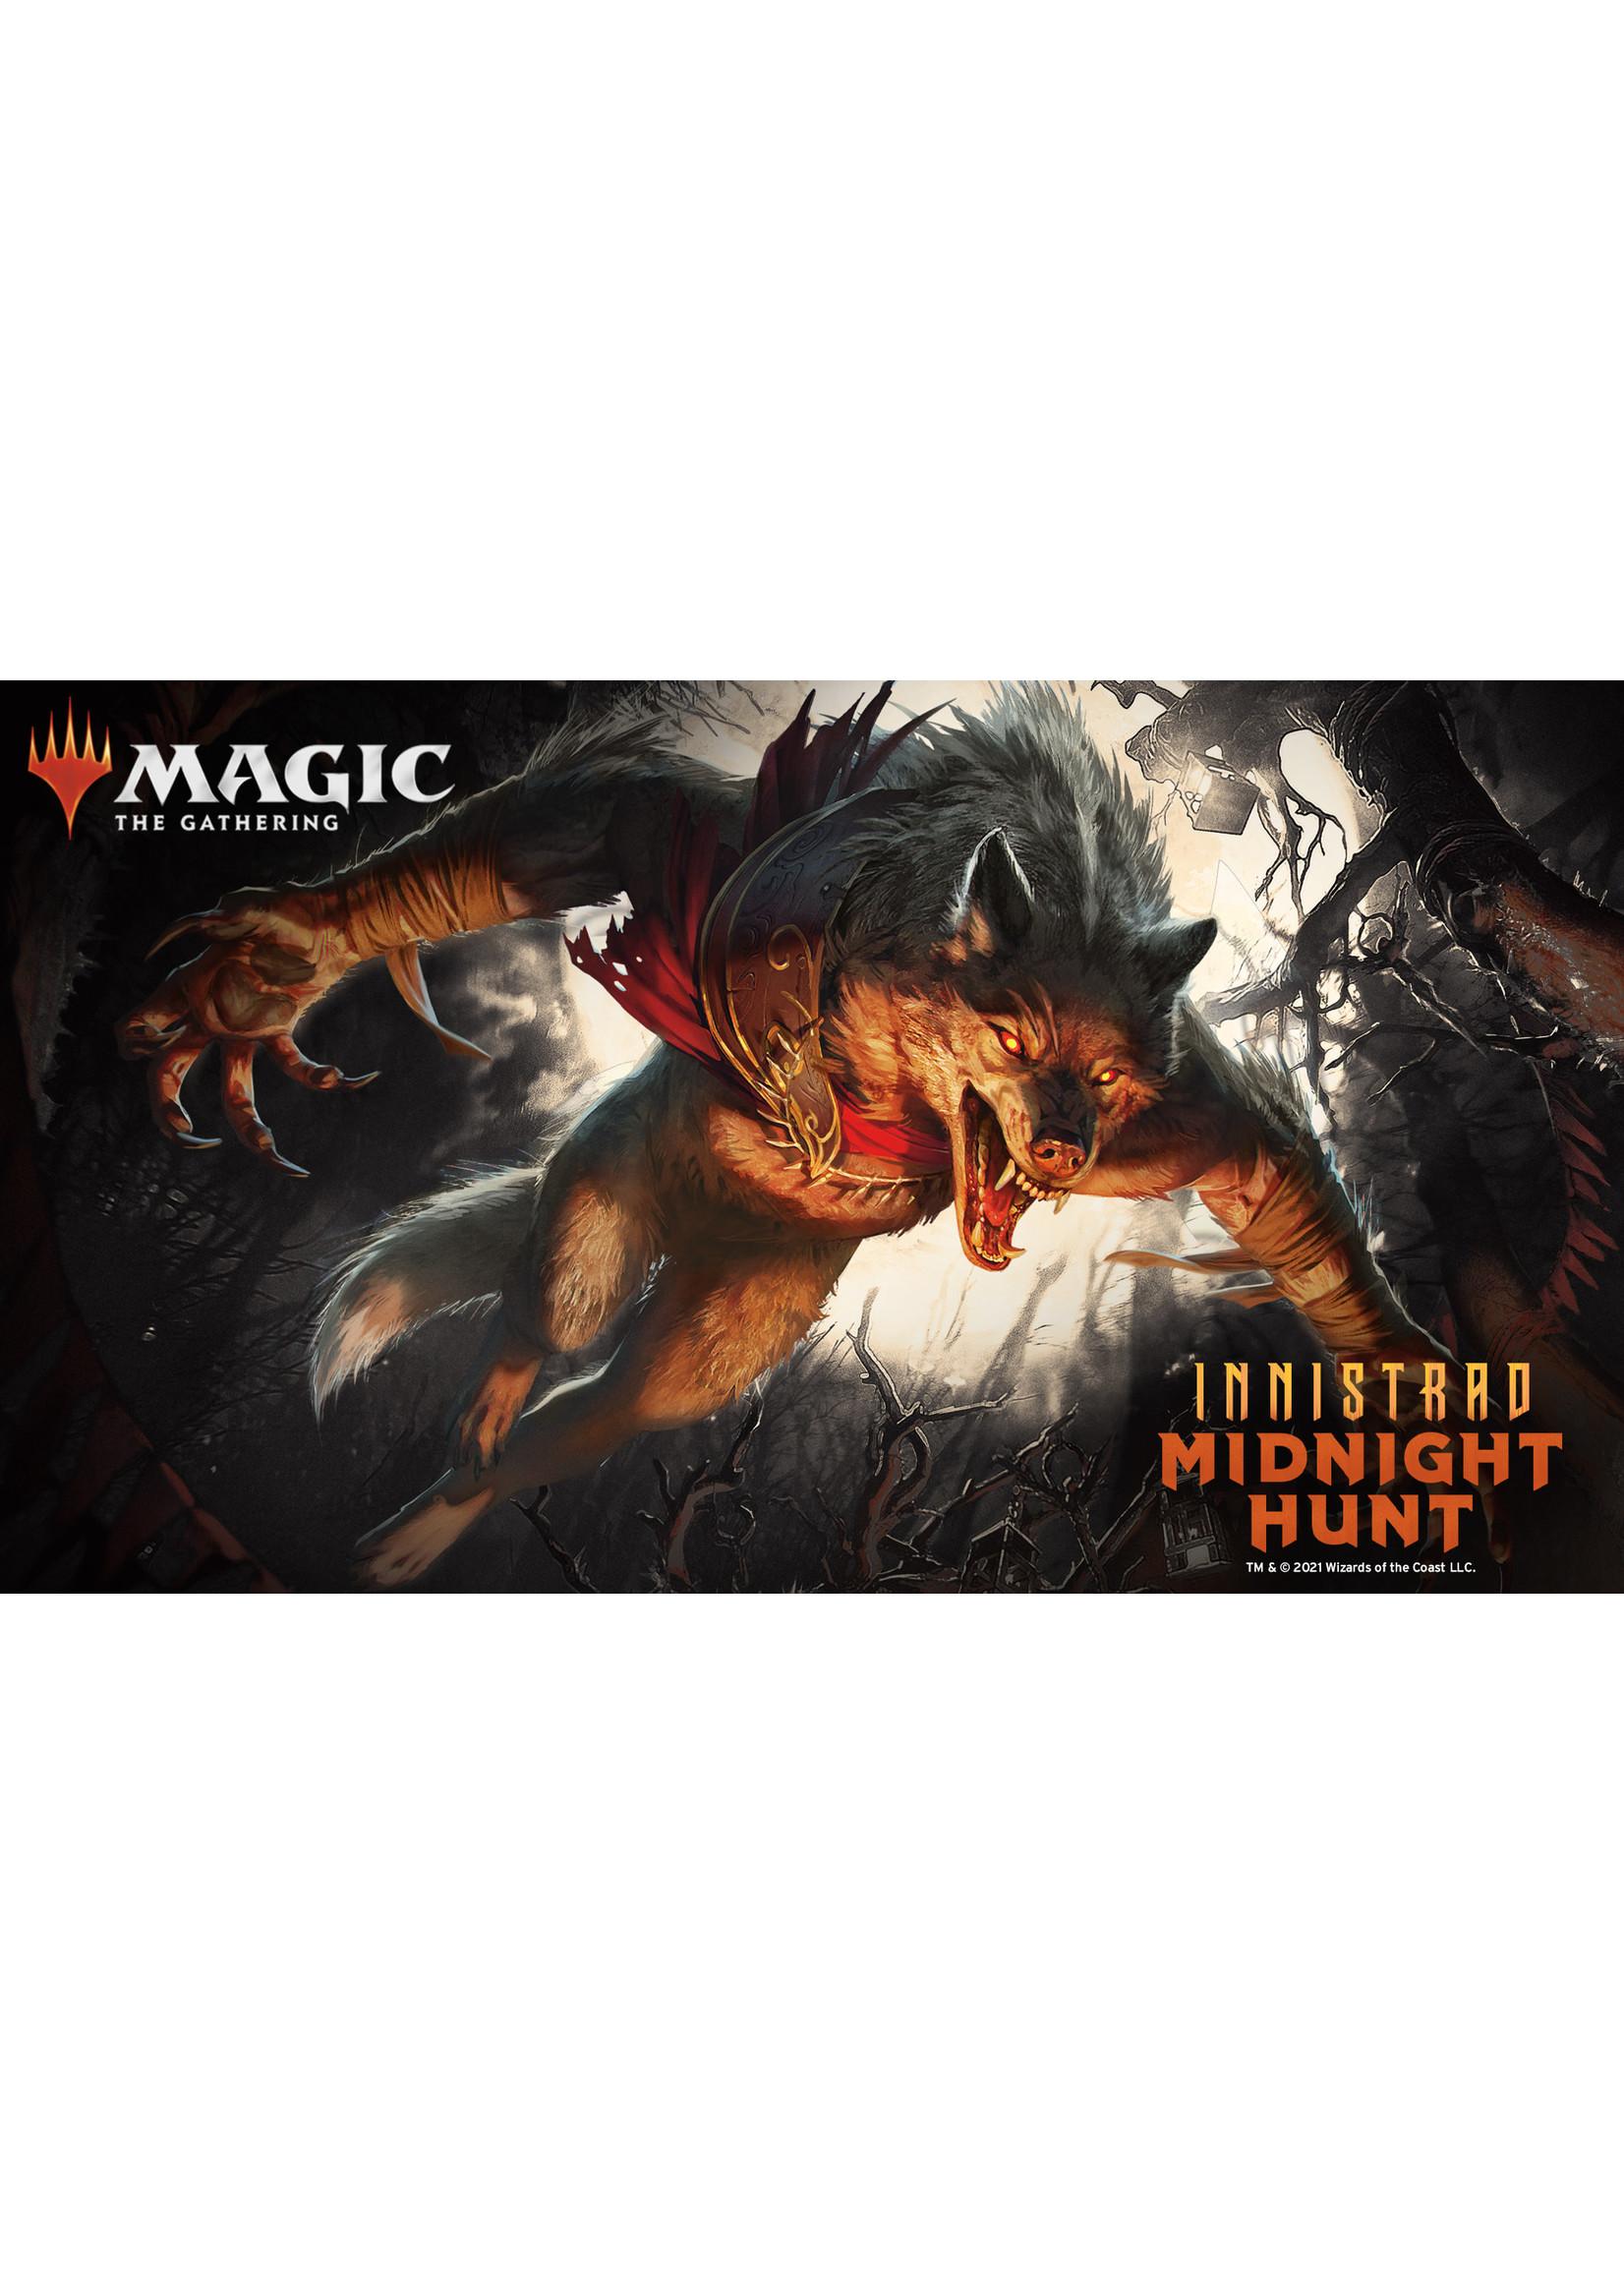 Magic: The Gathering Innistrad Midnight Hunt prerelease kit